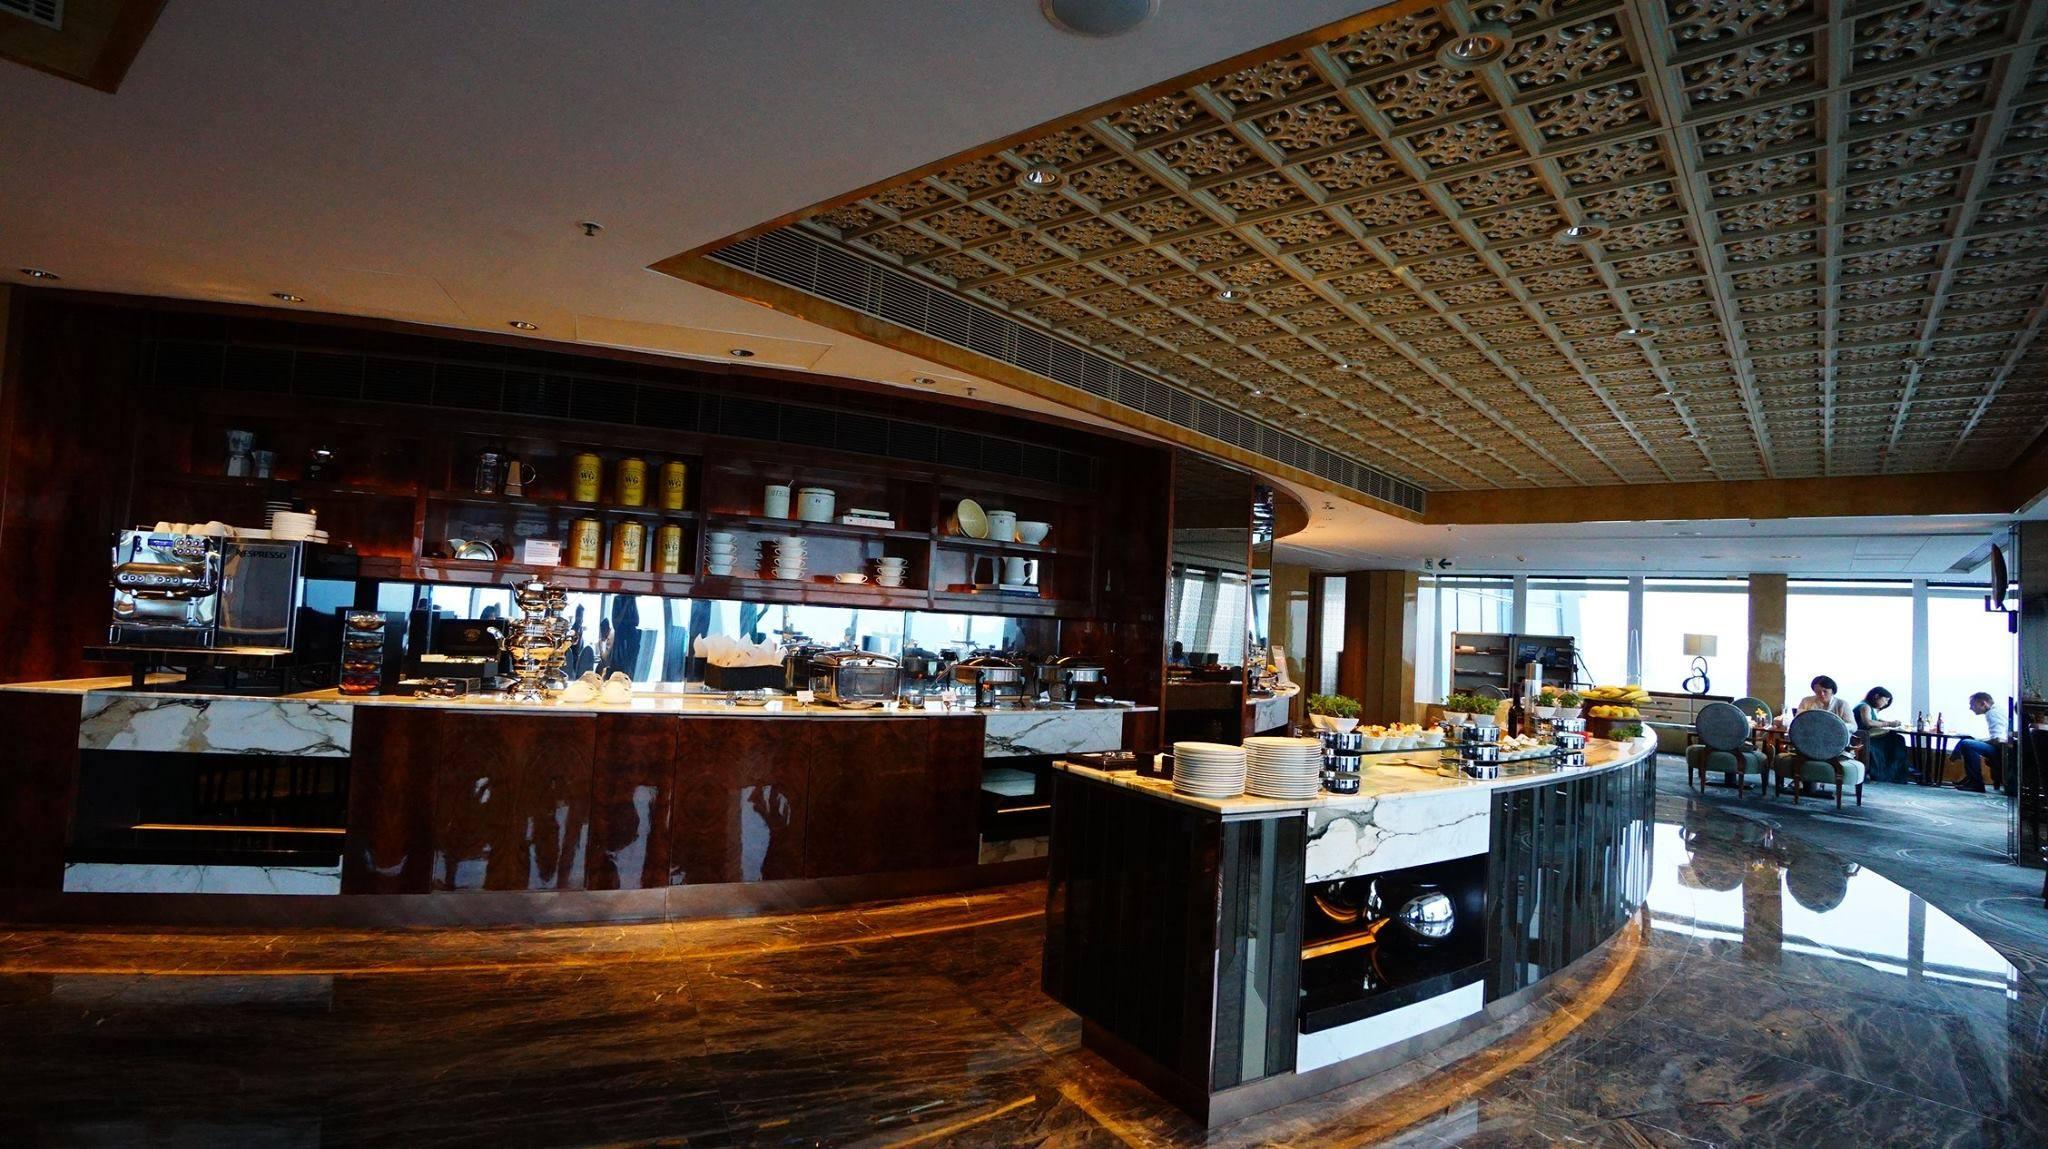 The Ritz Carlton Hong Kong 香港麗思卡爾頓酒店